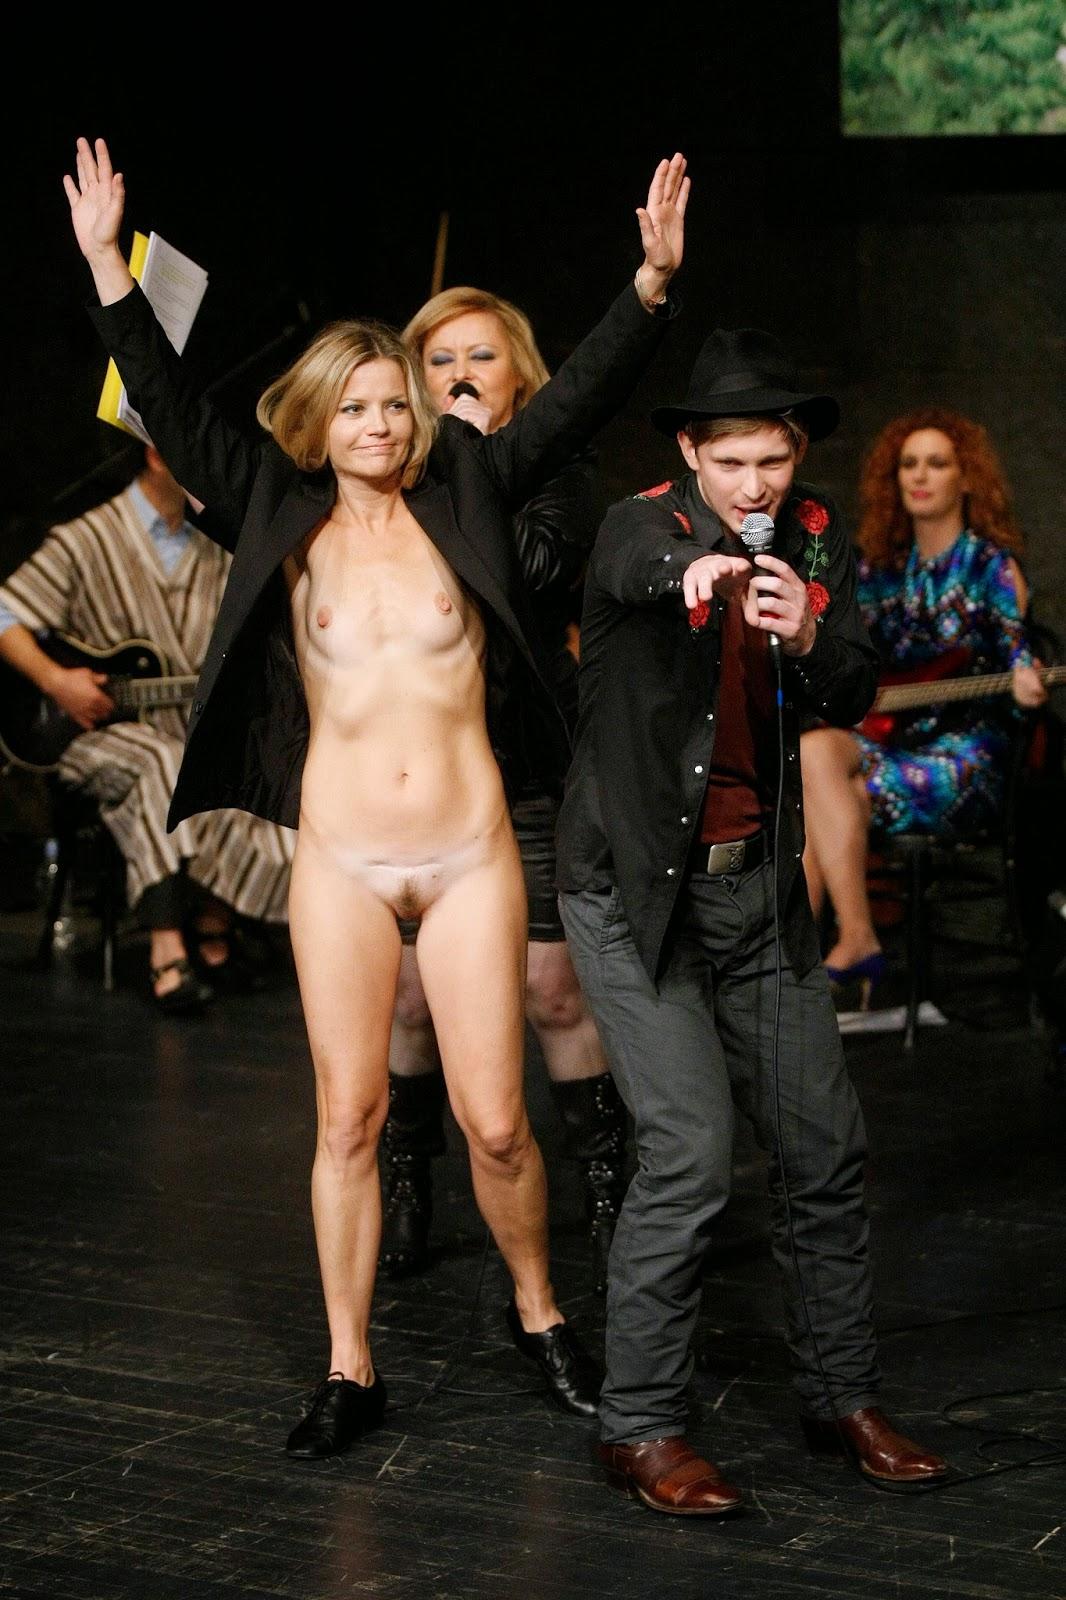 Девушка без трусиков на сцене фото